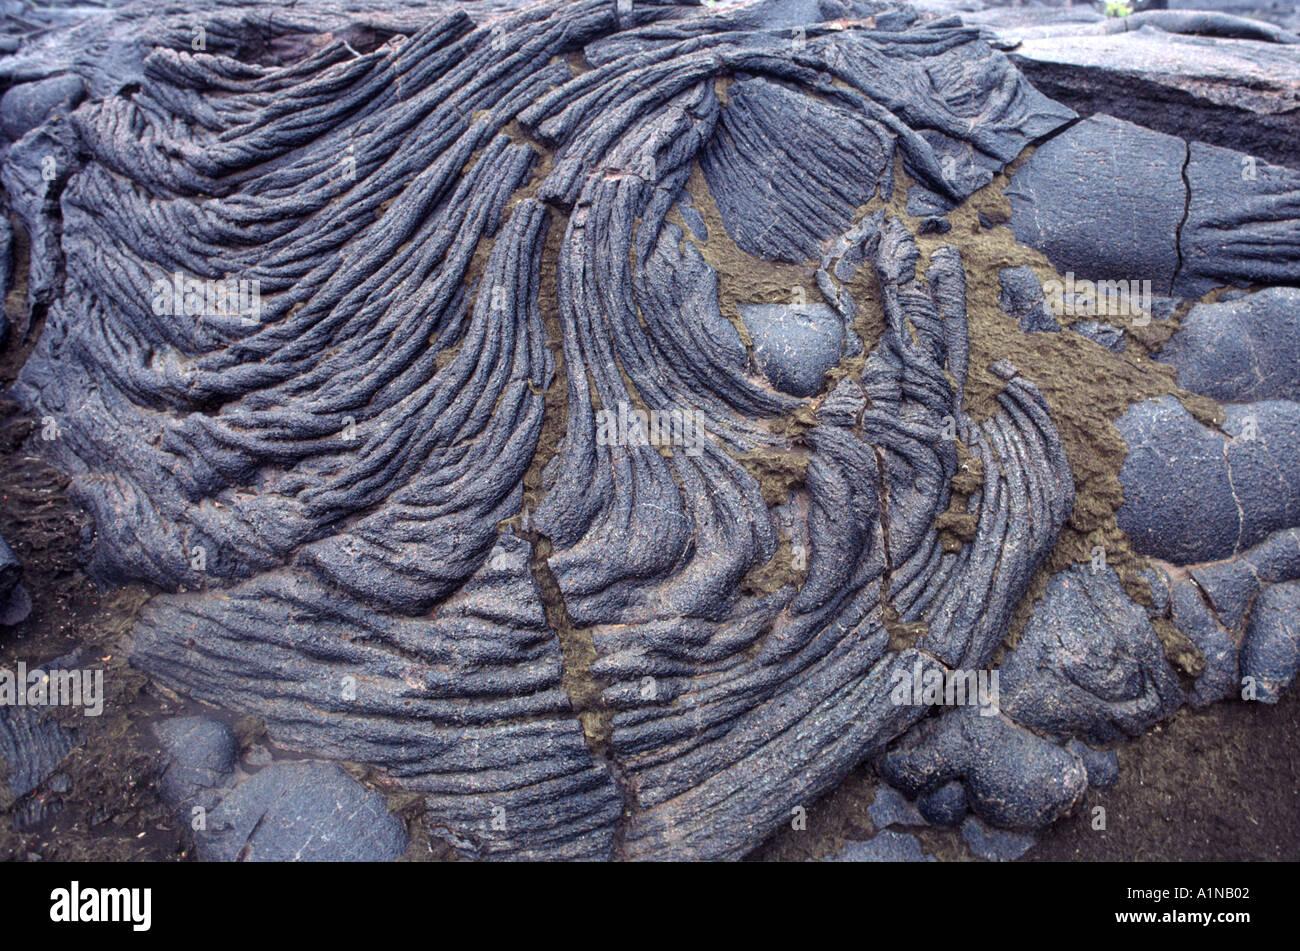 Pahoehoe basalt and Pele's hair along Mauna Iki Trail, Volcanoes National Park, Hawaii Stock Photo